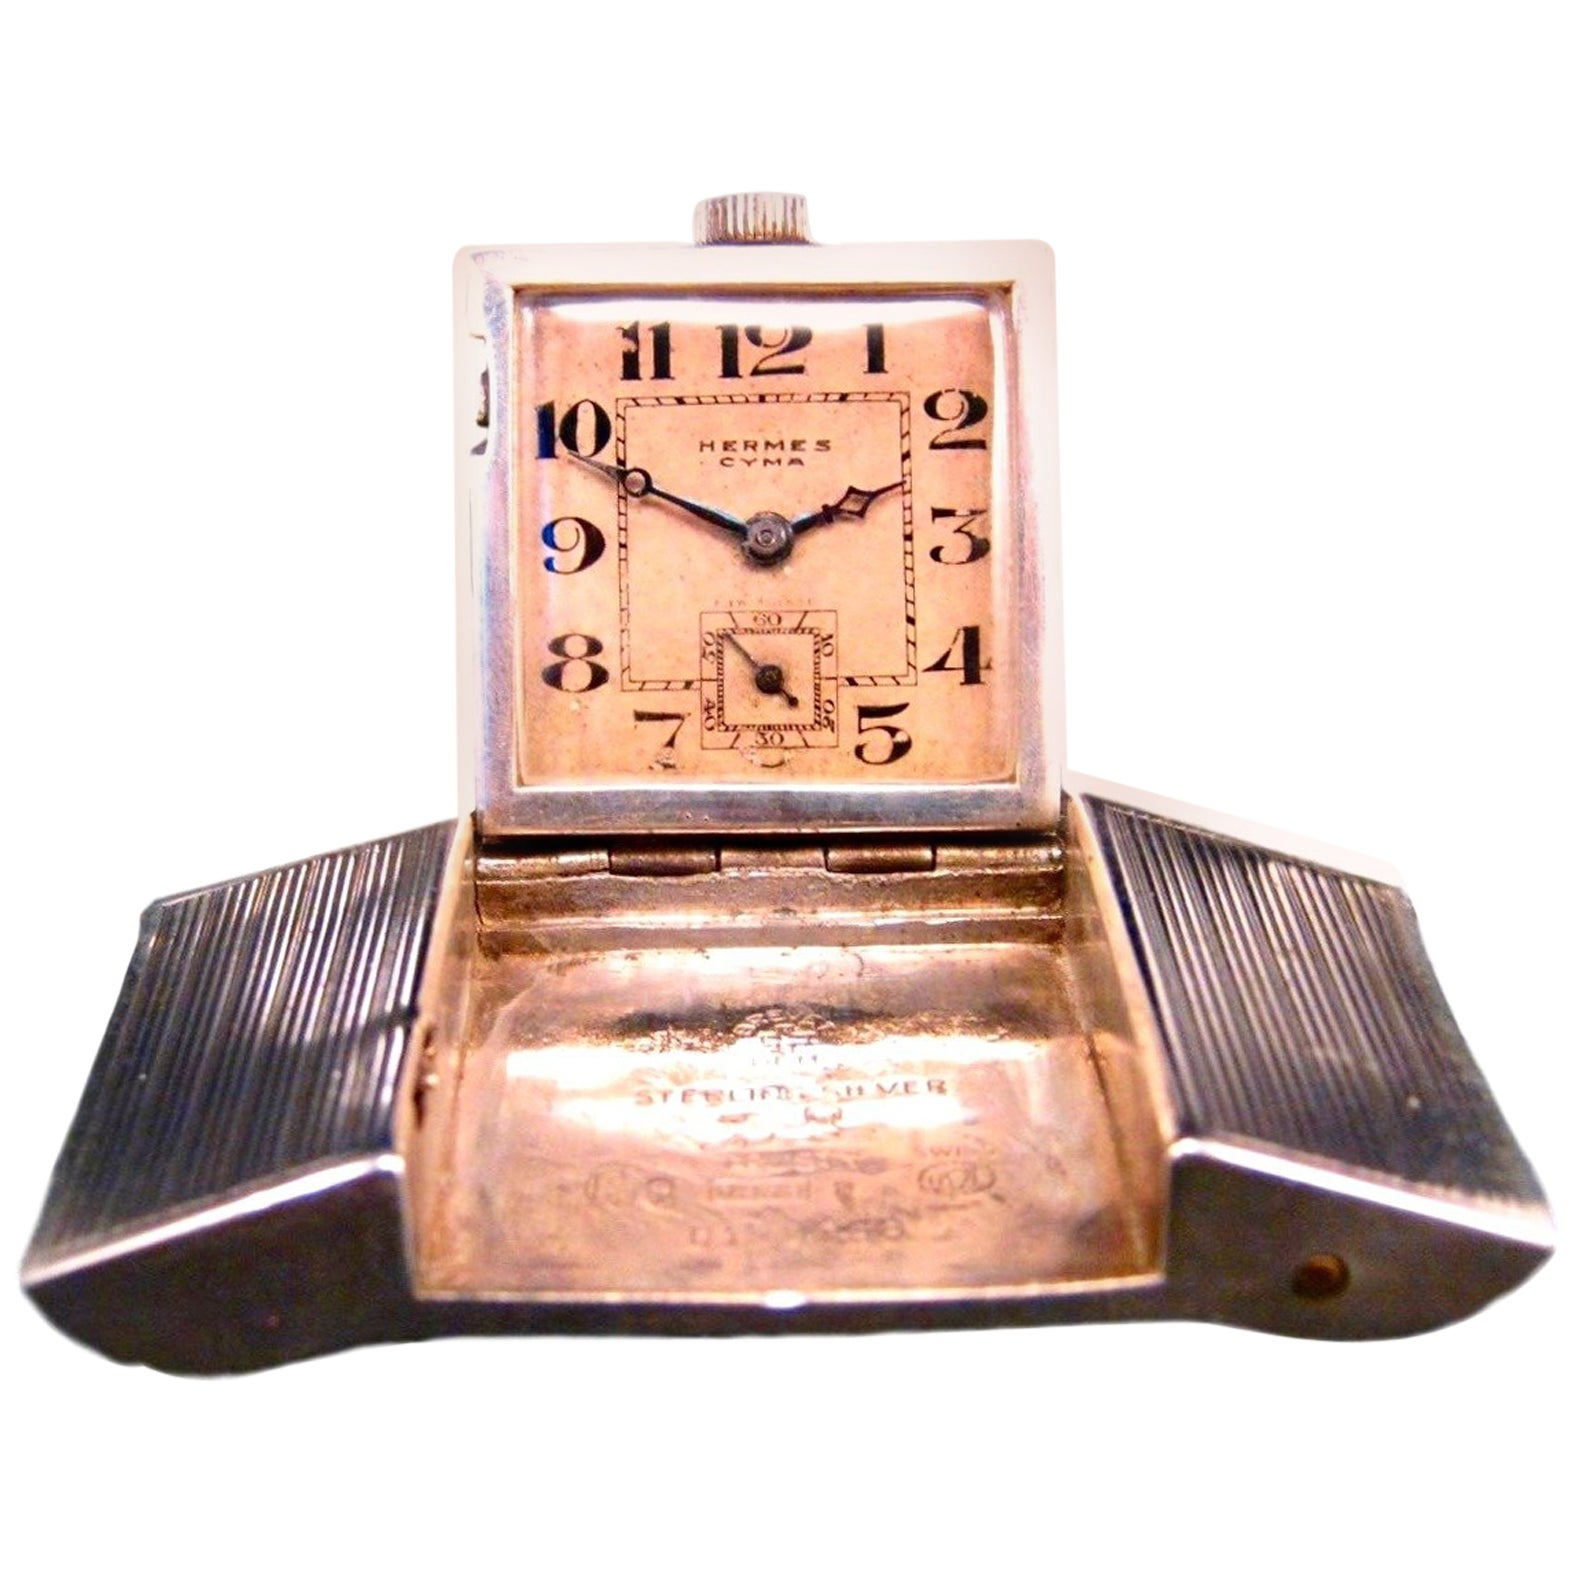 Hermes Belt Buckle Watch from 1930s